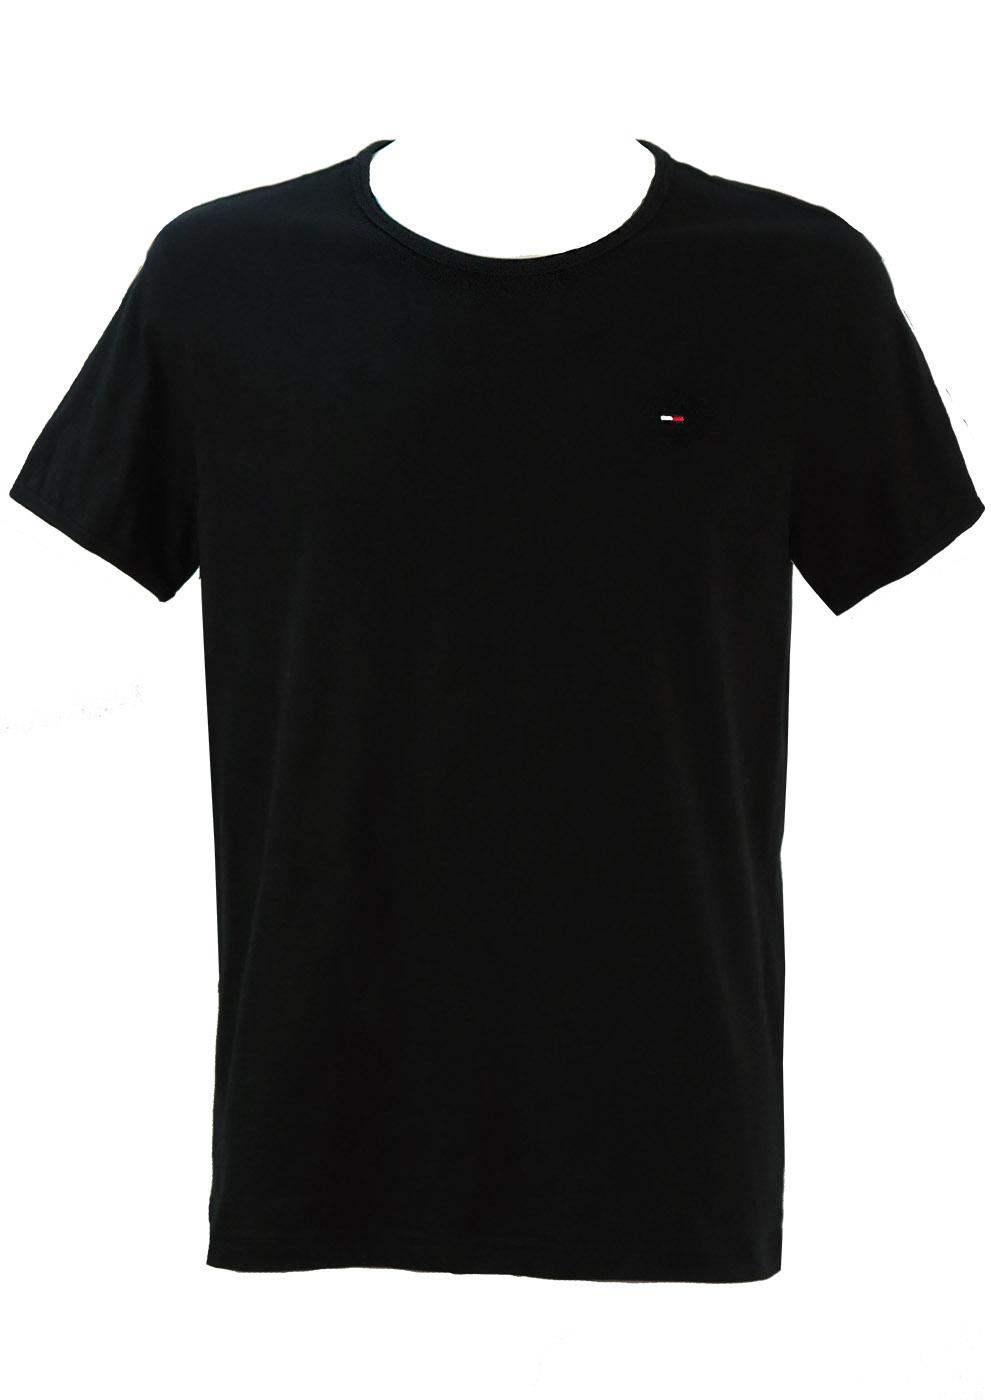 Black Tommy Hilfiger T-Shirt – M/L – Reign